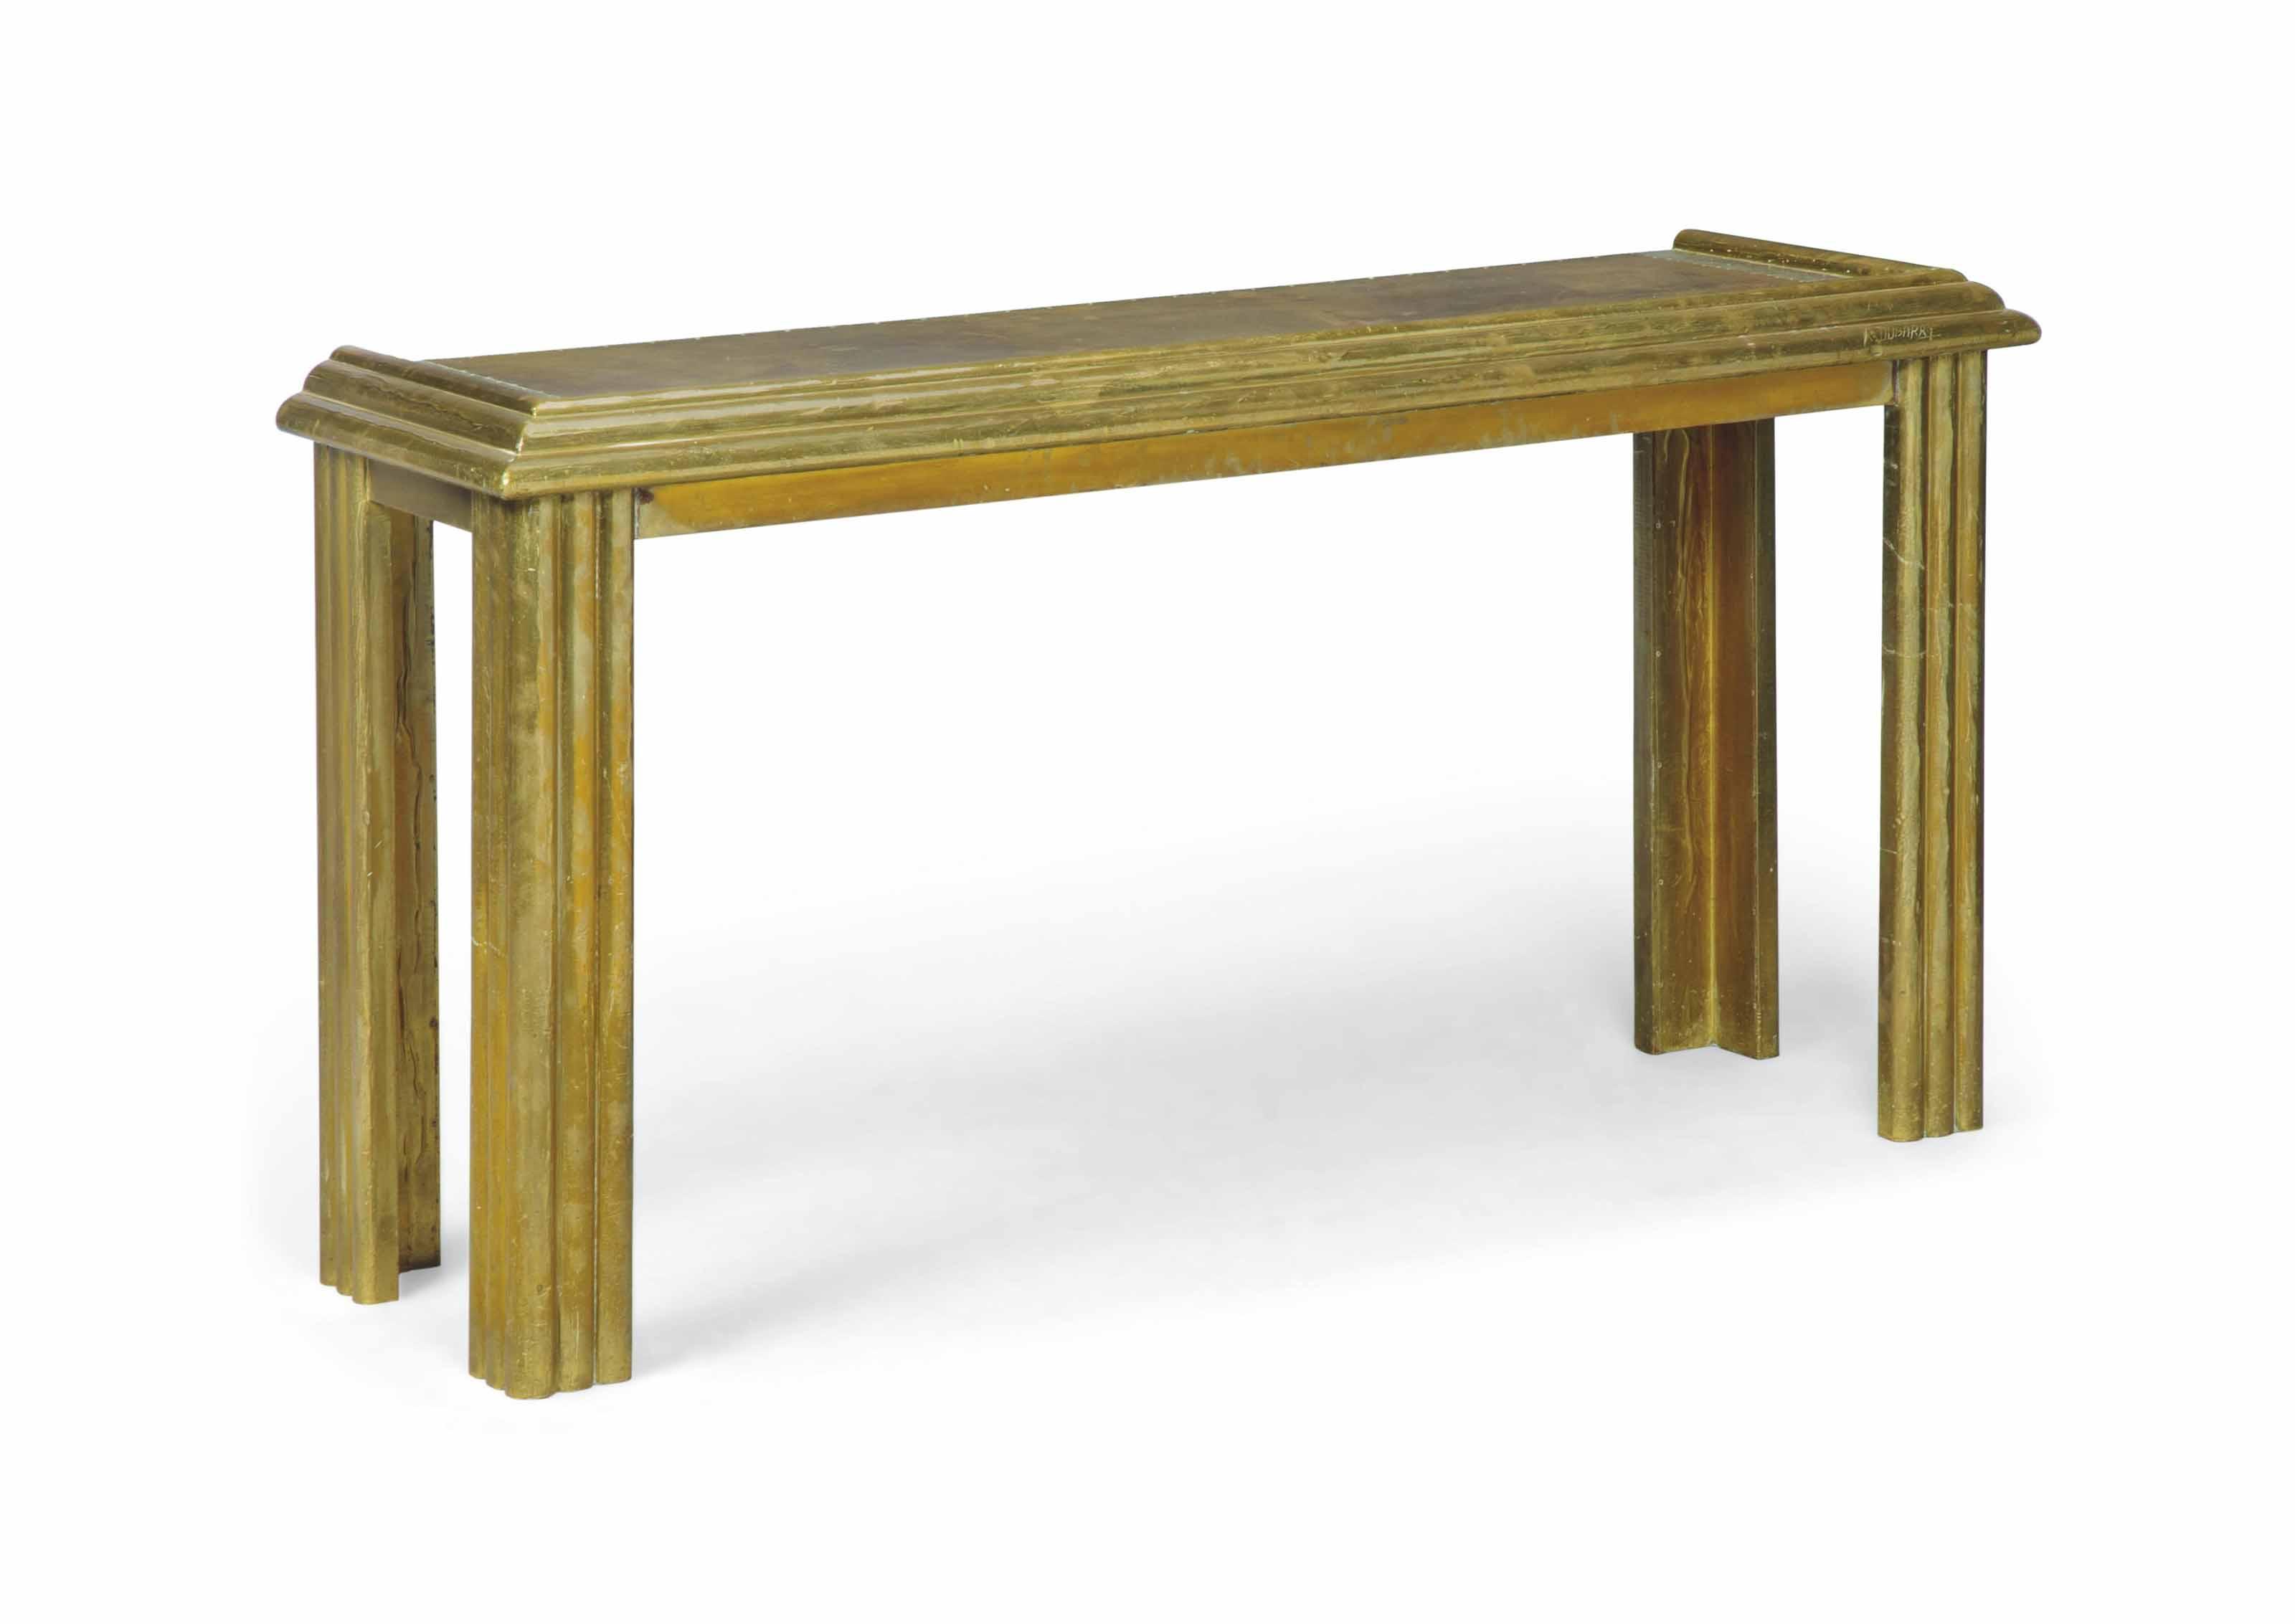 AN R. DUBARRY BRASS CLAD CONSOLE TABLE